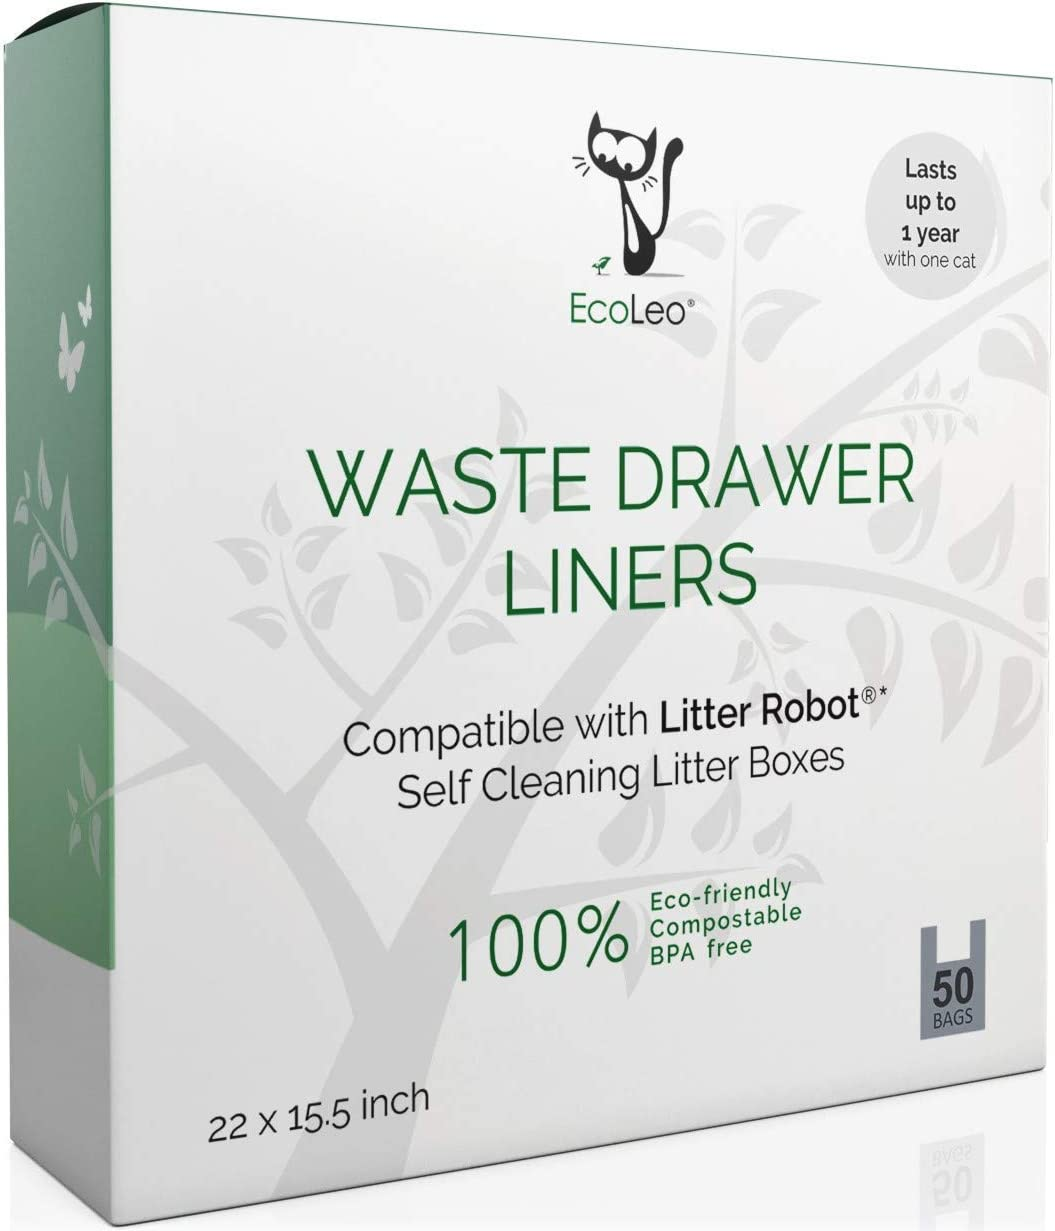 EcoLeo - Bolsas de Basura para cajones de Basura automatizadas para Robots – ecológico, Certificado compostable, Grueso, Duradero: Amazon.es: Productos para mascotas